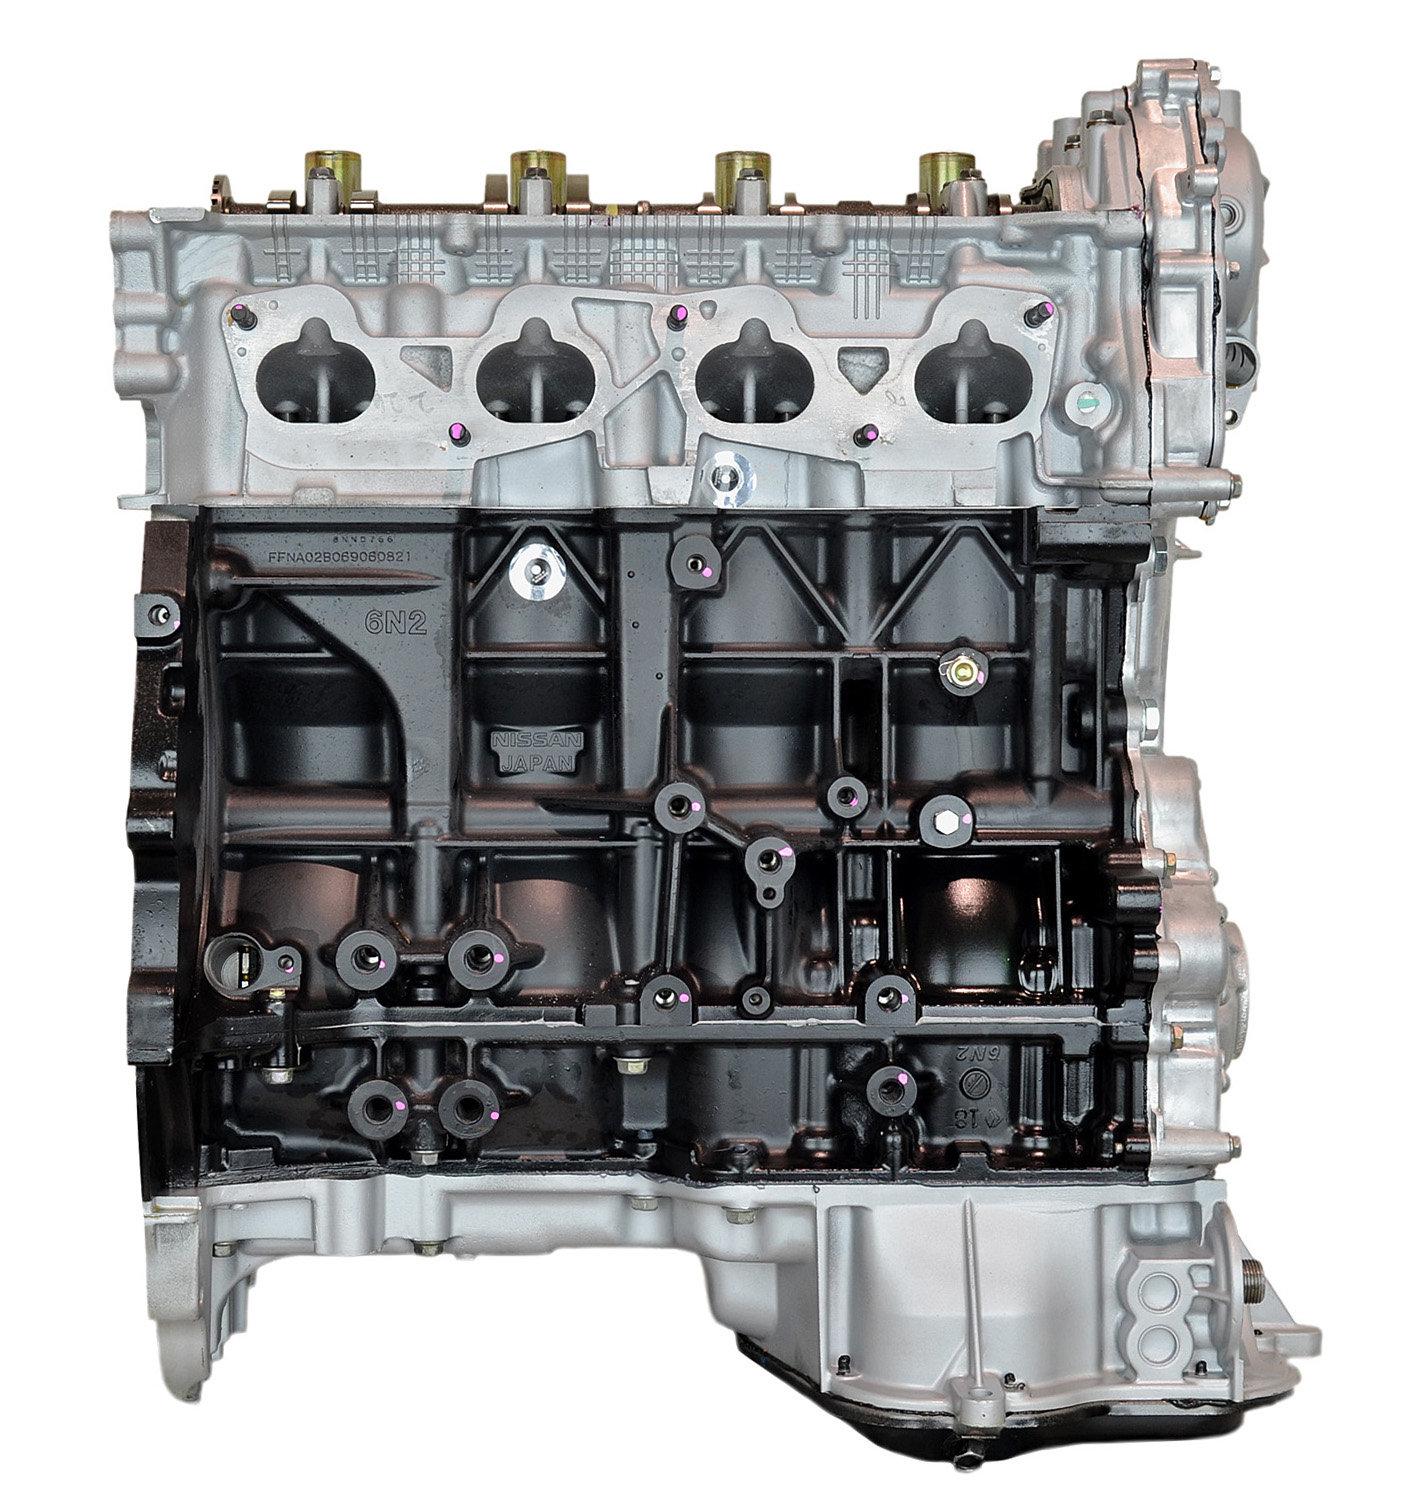 02-06 Nissan Altima 2.5-Liter QR25DE Engine